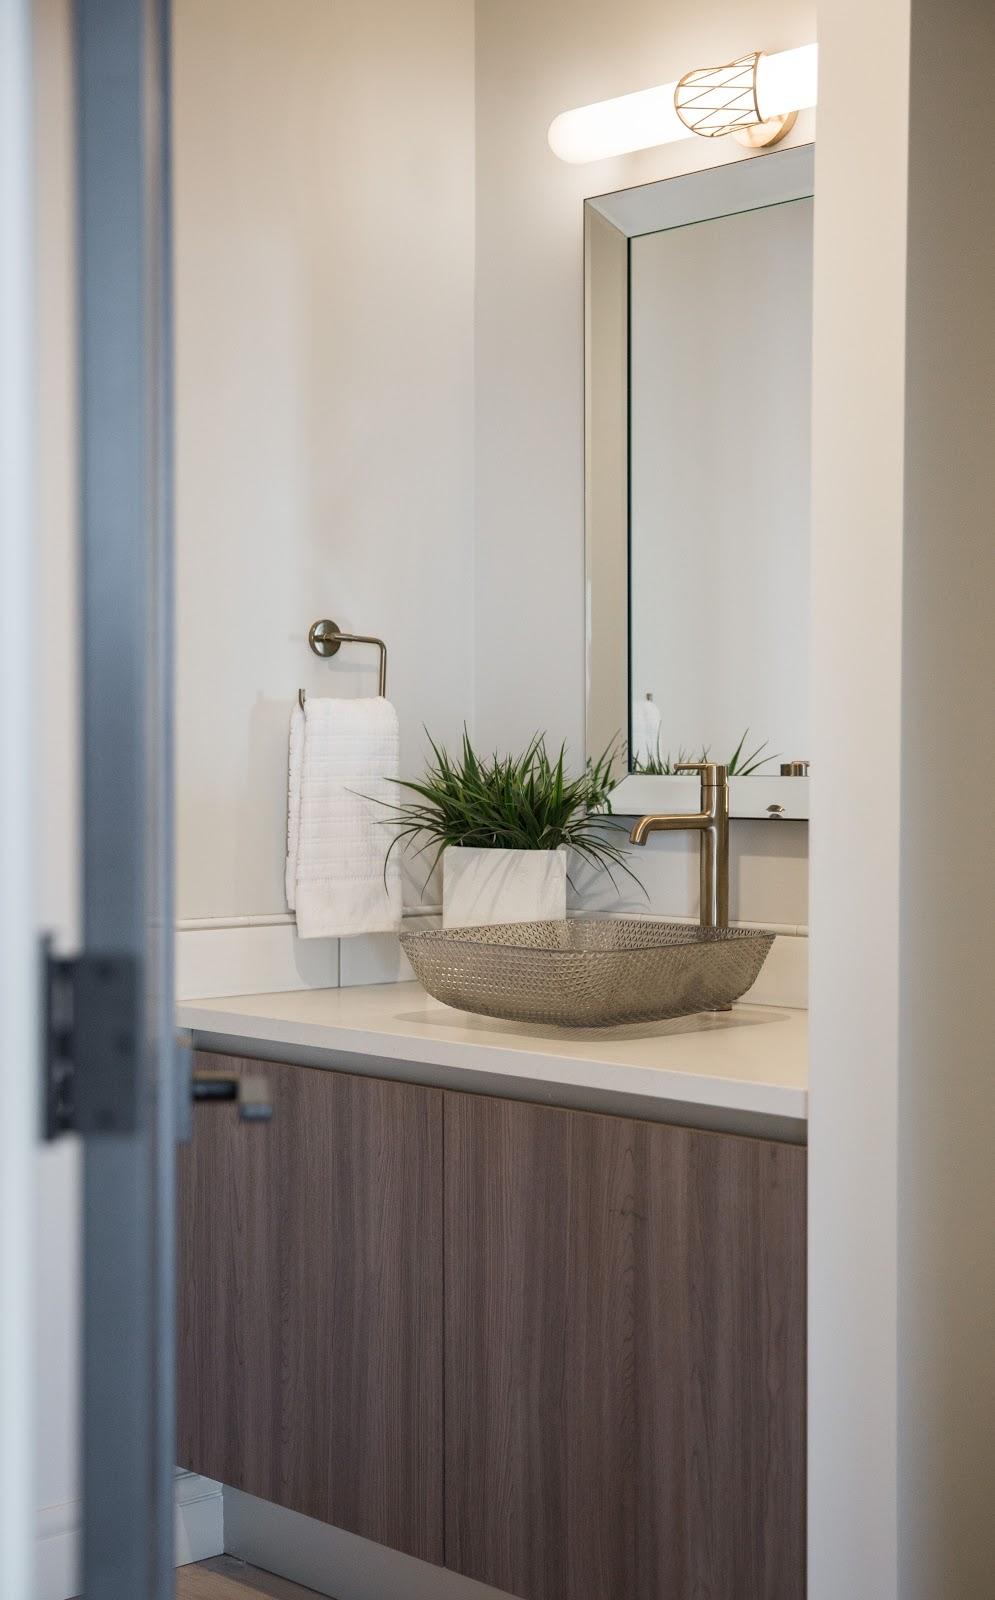 Calgary interior design modern traditional cosy elegant powder room wow factor gold sink golden filigree lighting